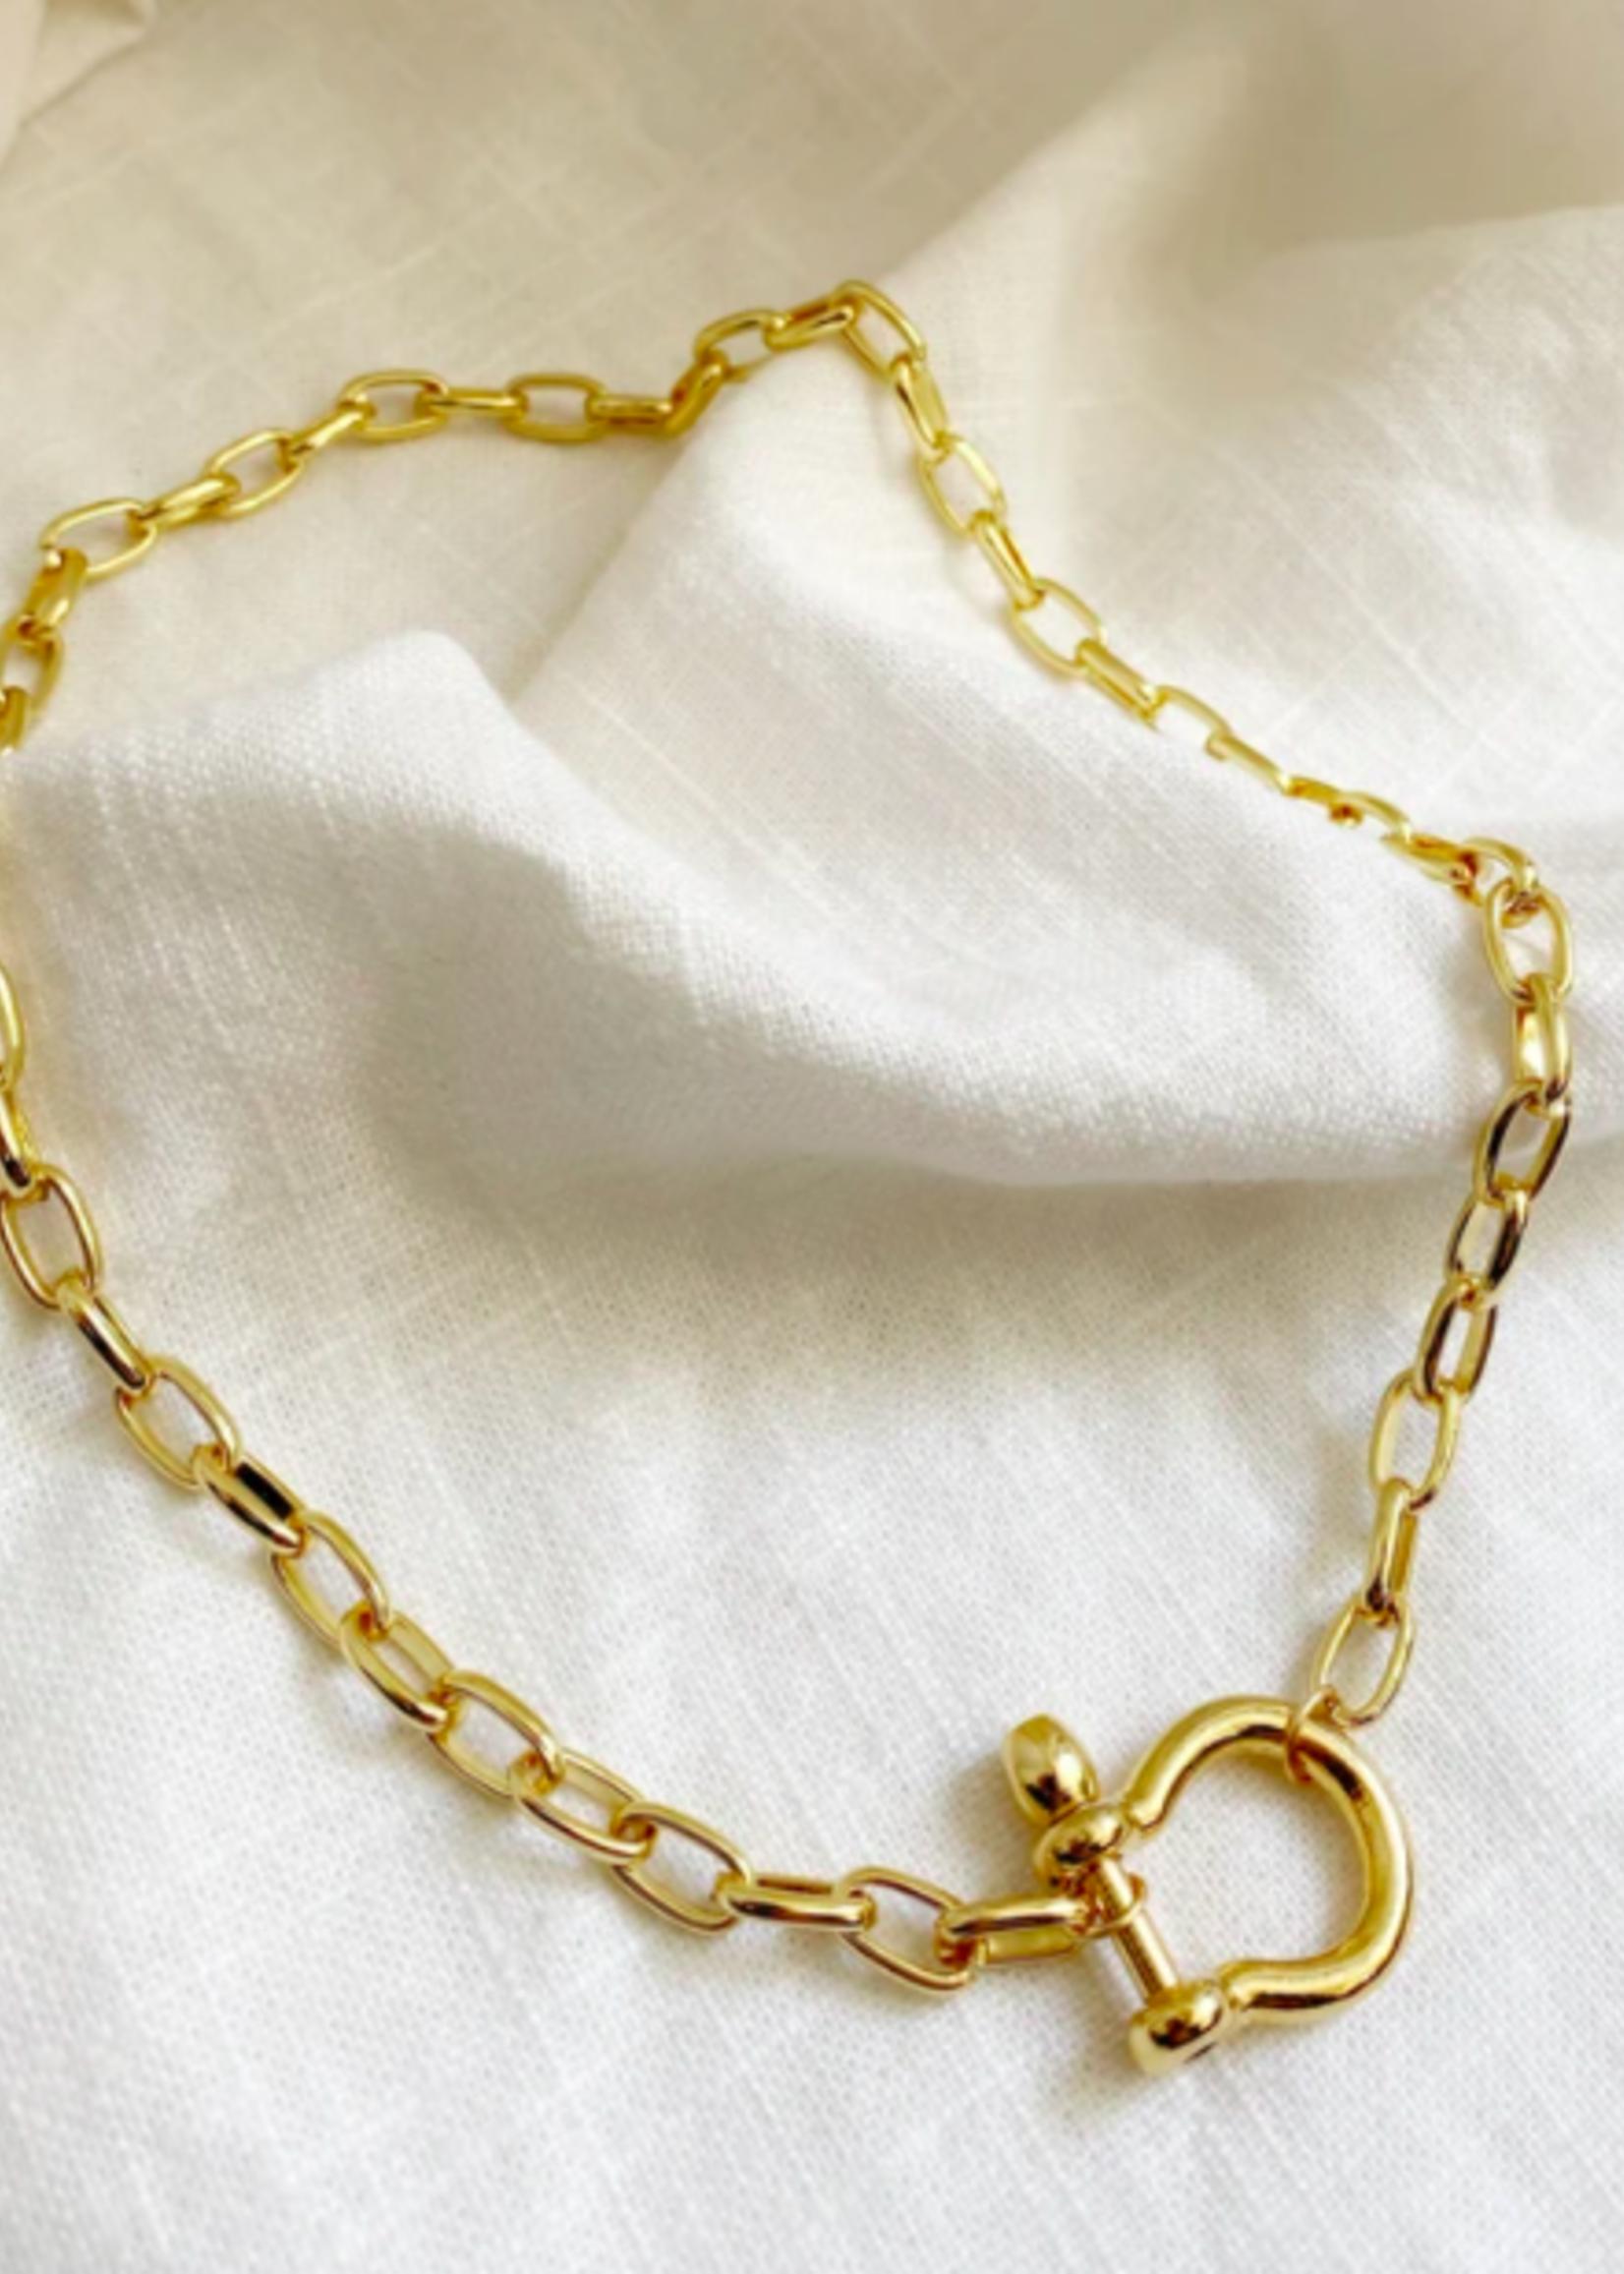 Bofemme Bofemme Celine Gold Necklace